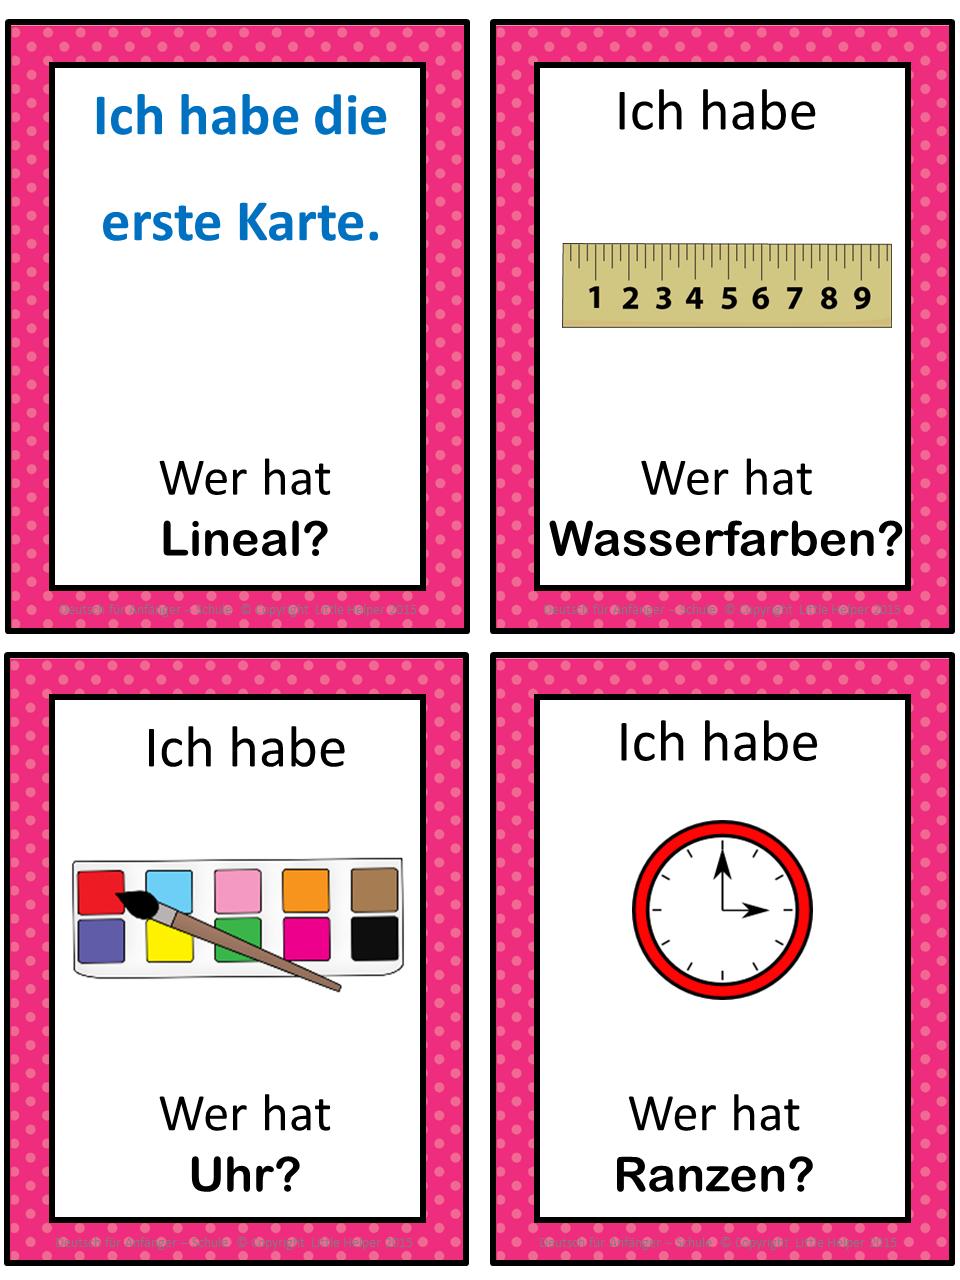 German School Words Ich Habe Wer Hat Game School Word Foreign Language Learning Learn German